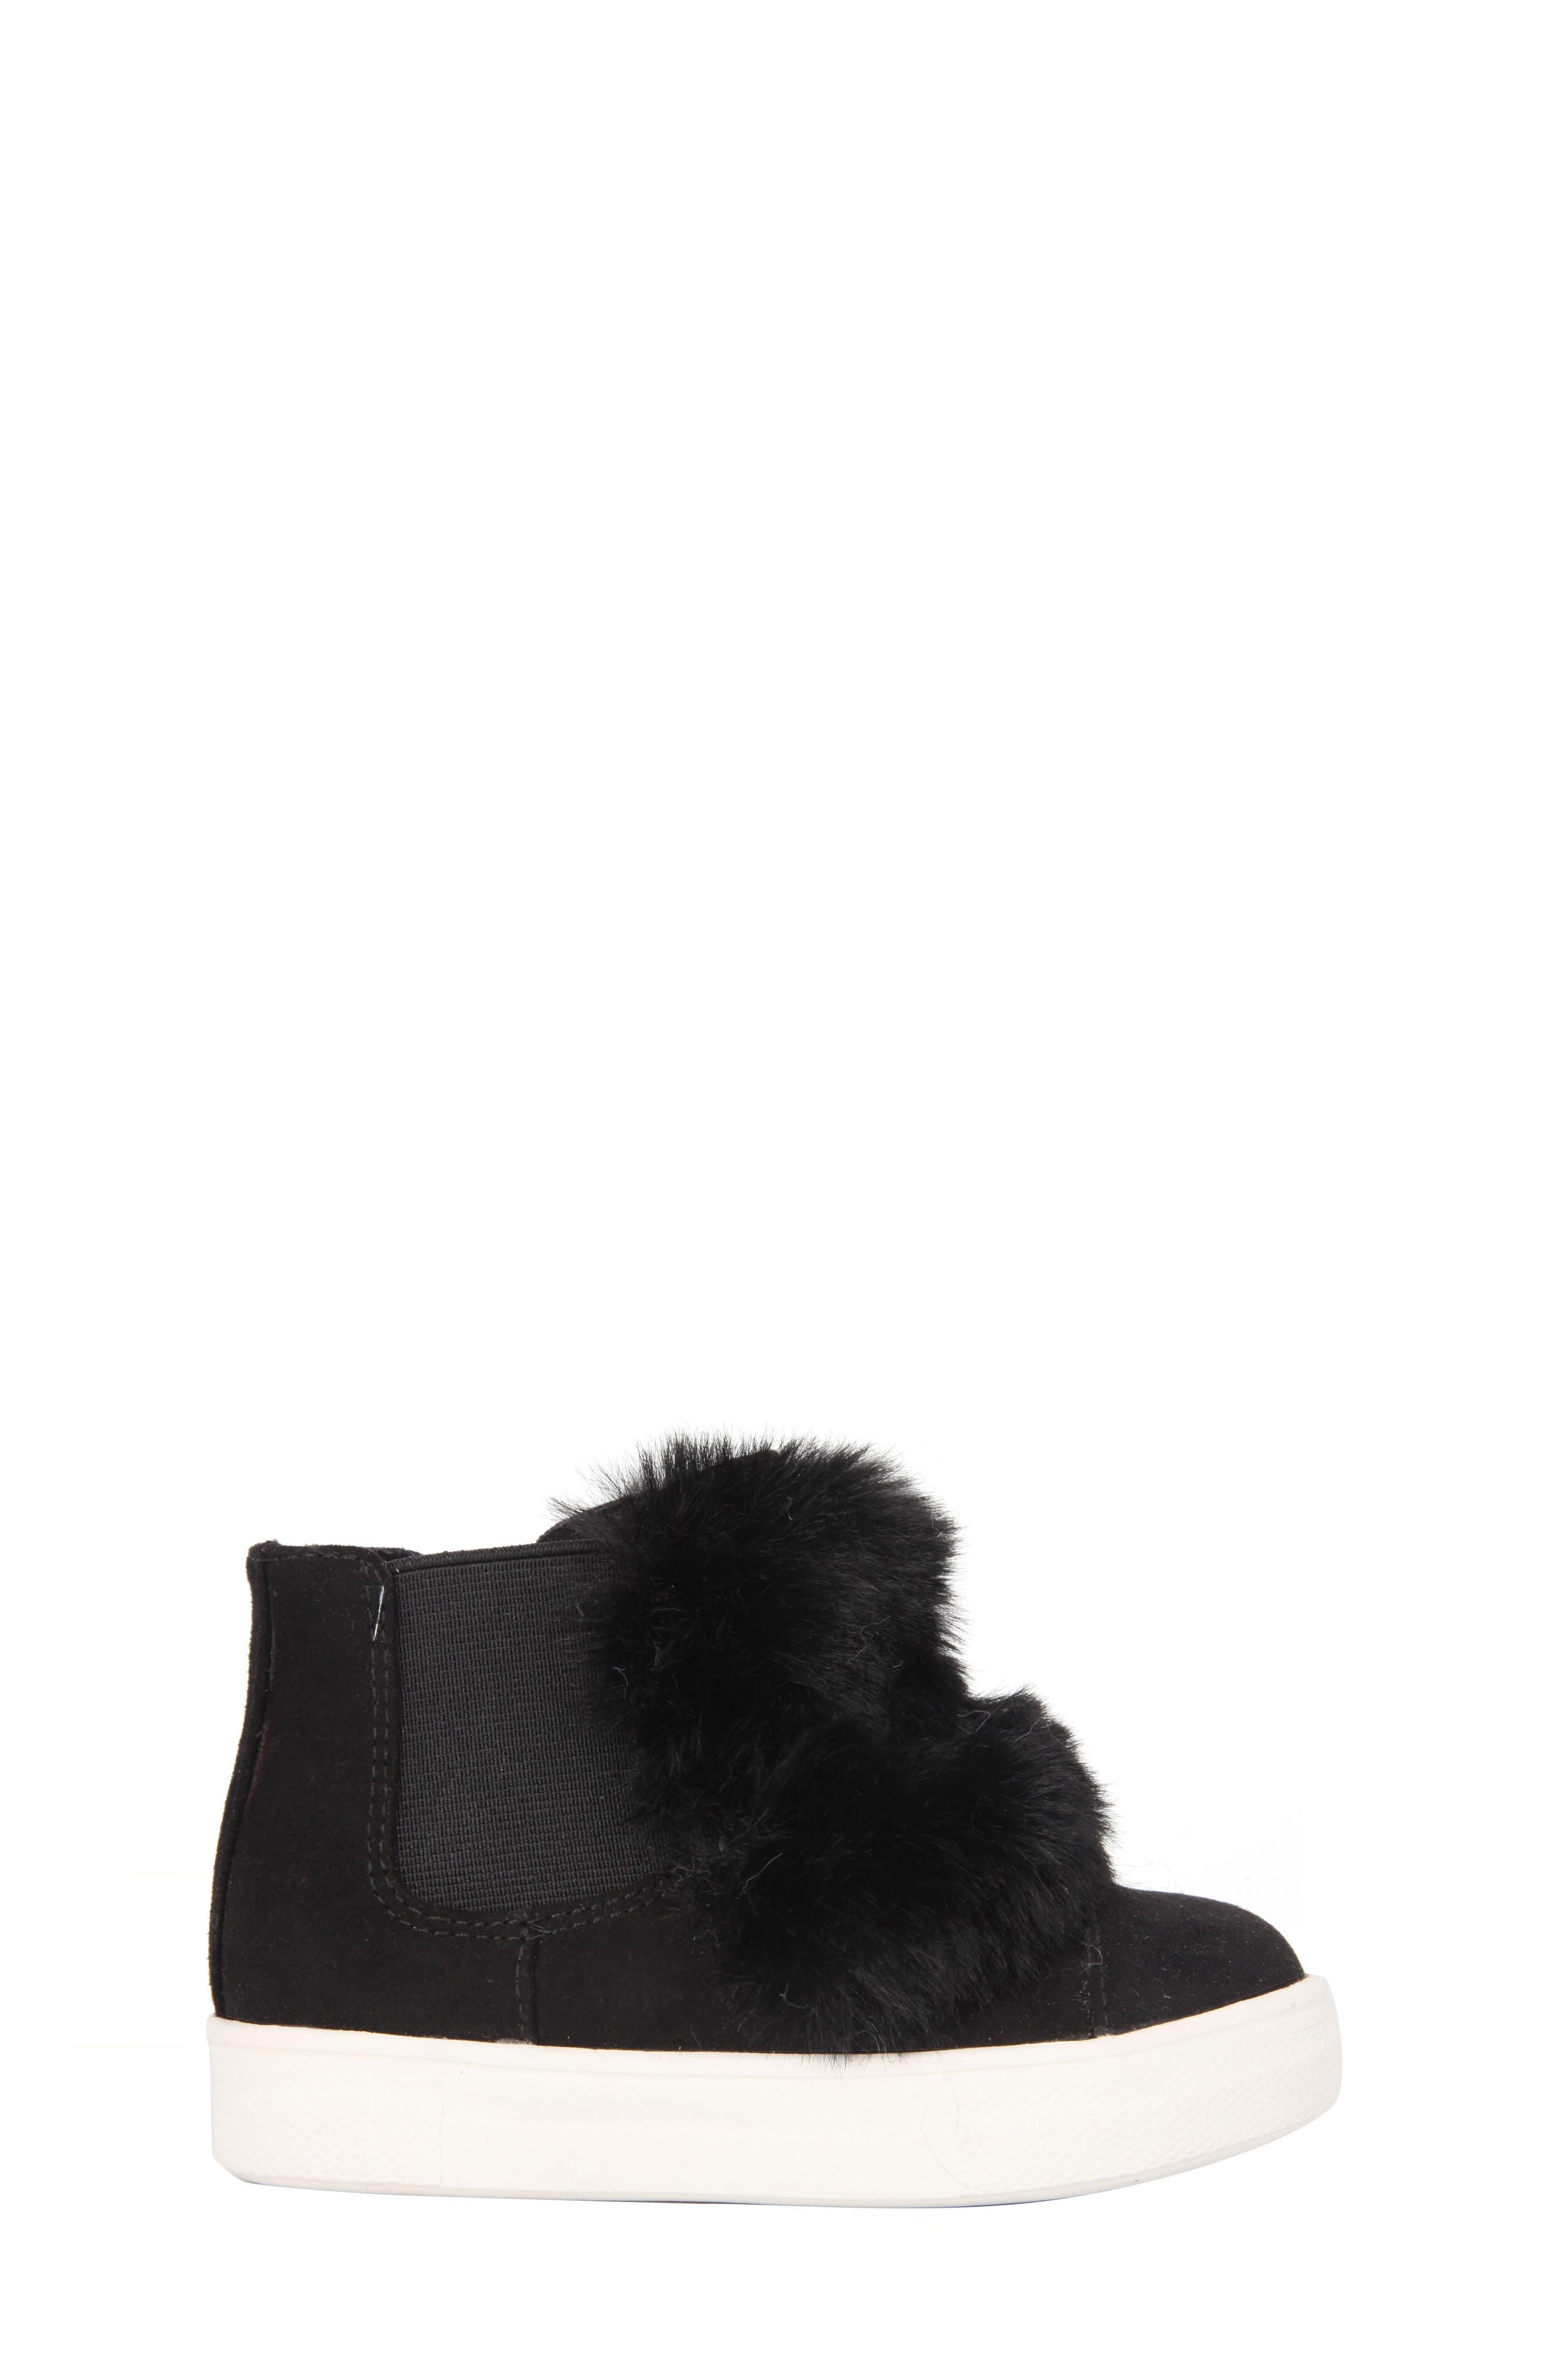 Helen Faux Fur Bootie Sneaker,                             Alternate thumbnail 3, color,                             Black Microsuede